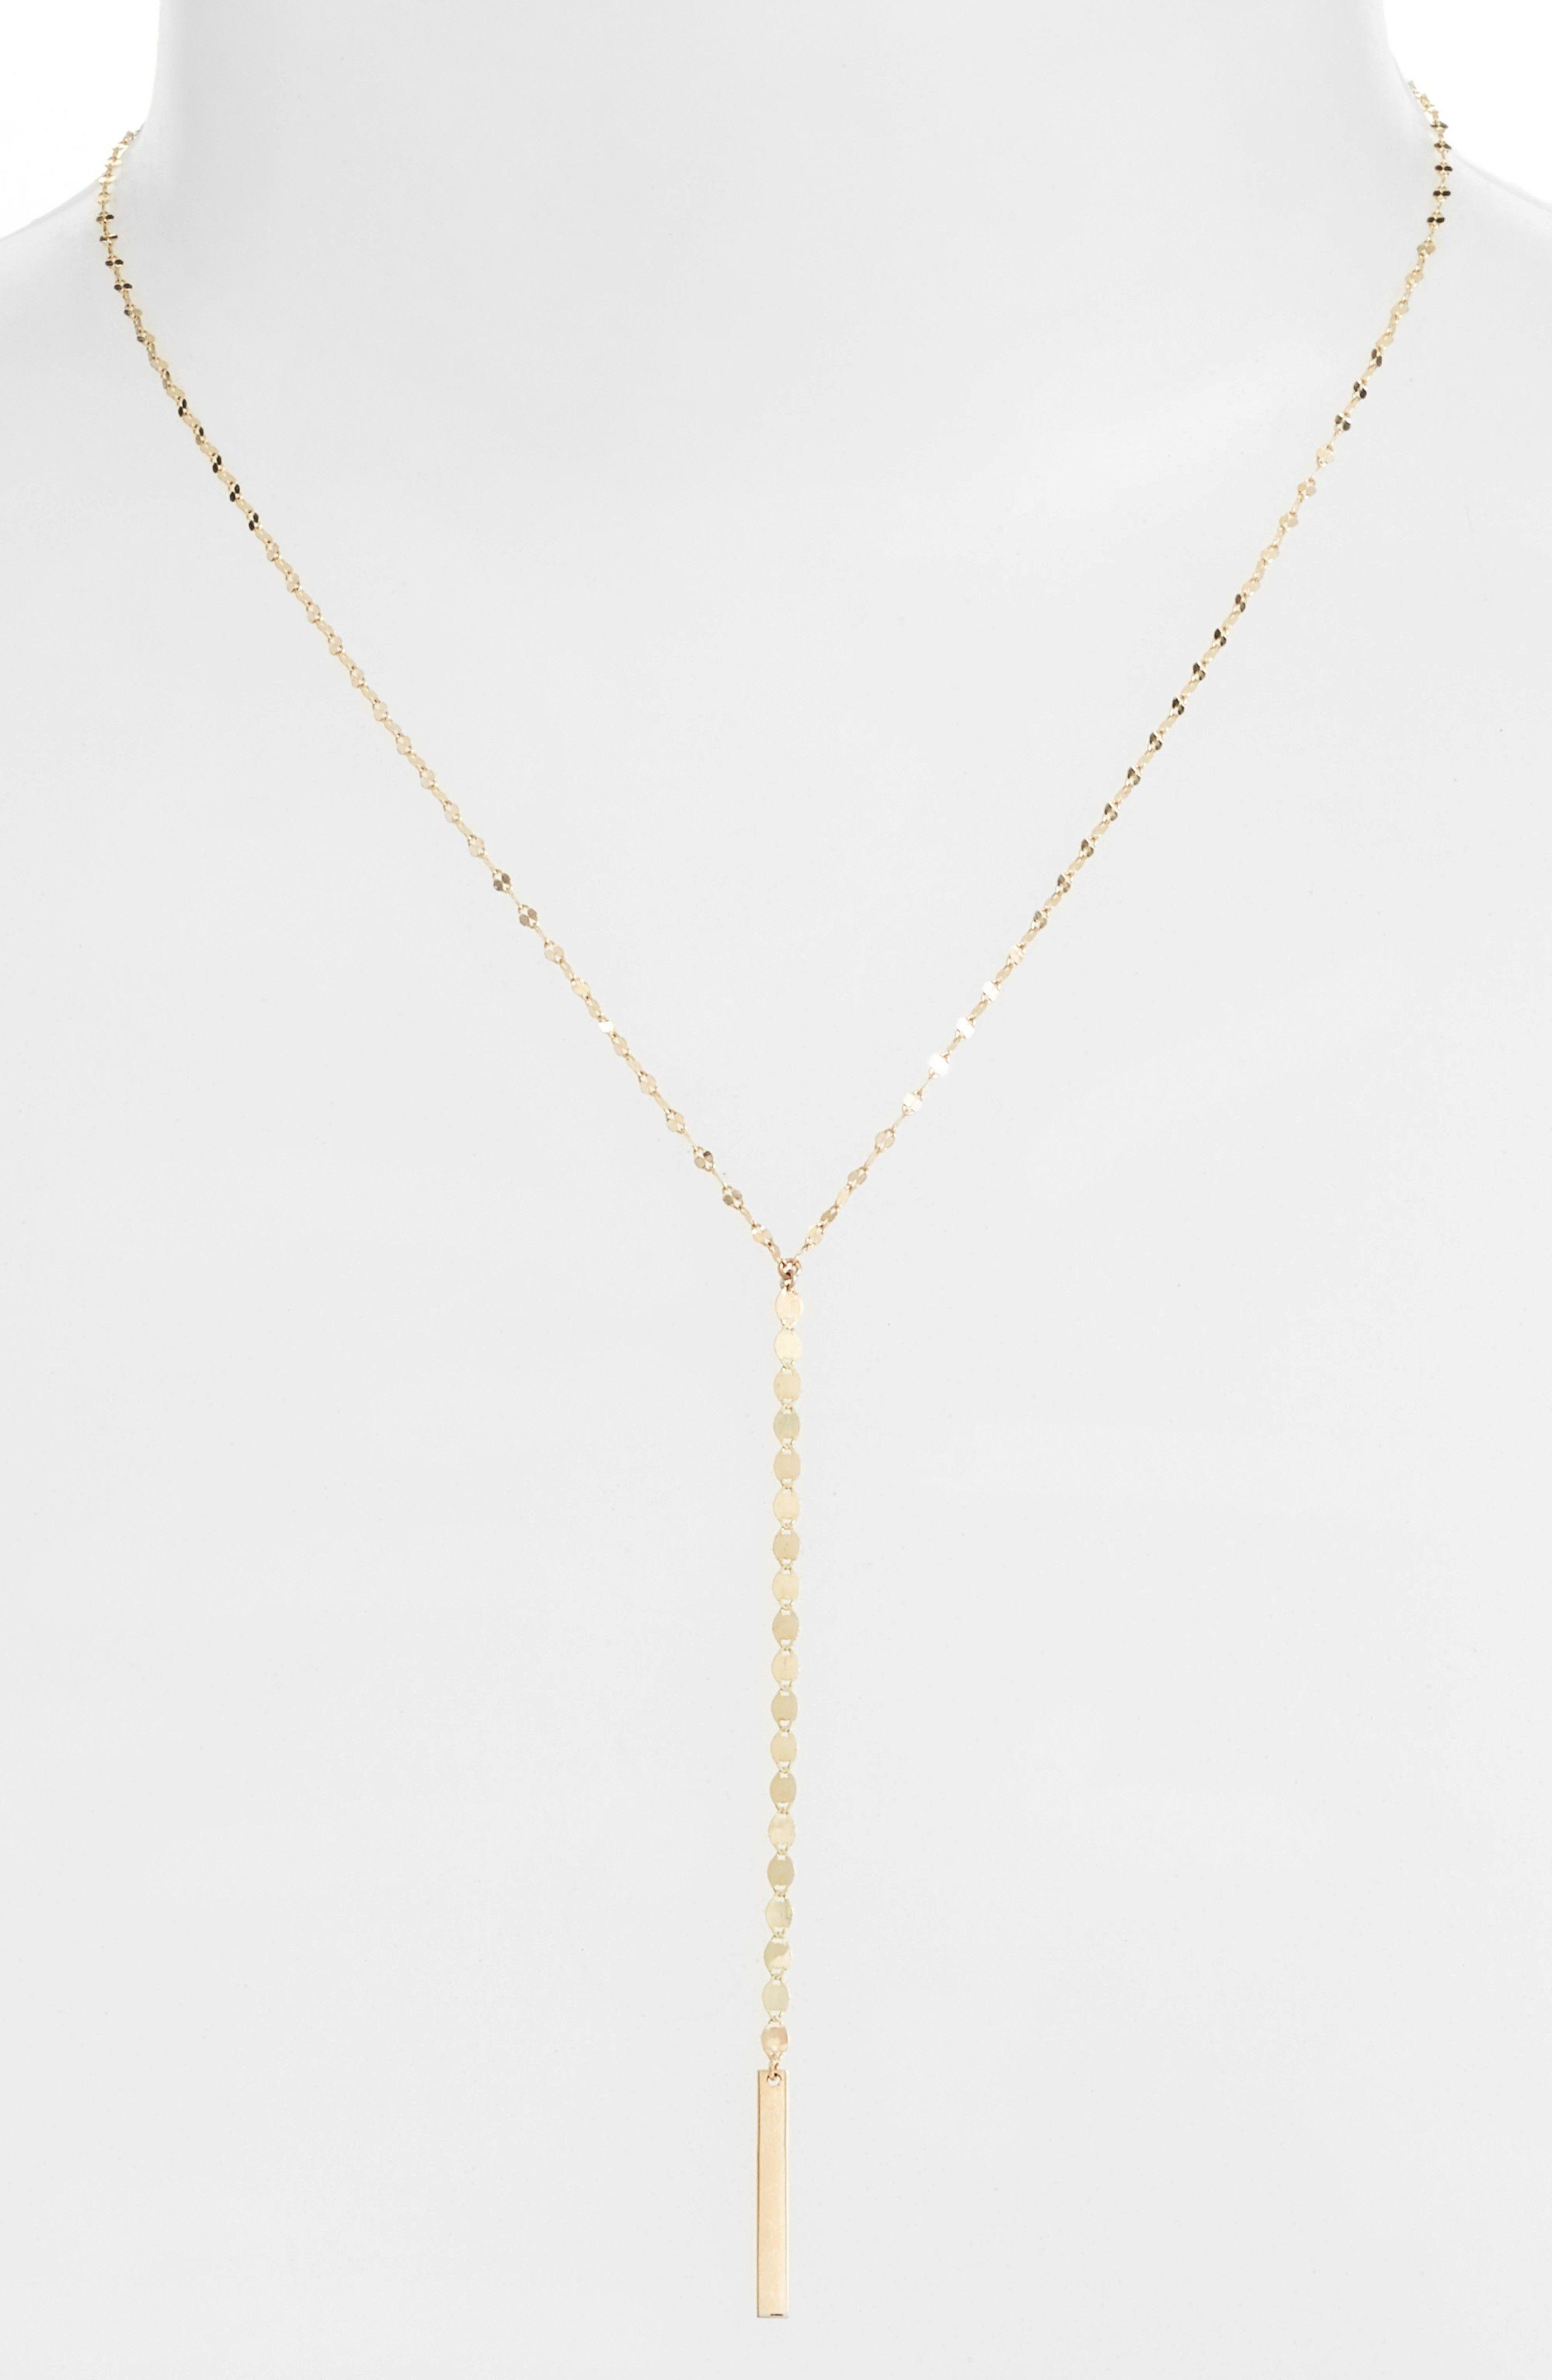 Lana Jewelry Nude Remix Layering Necklace KYPTINd6